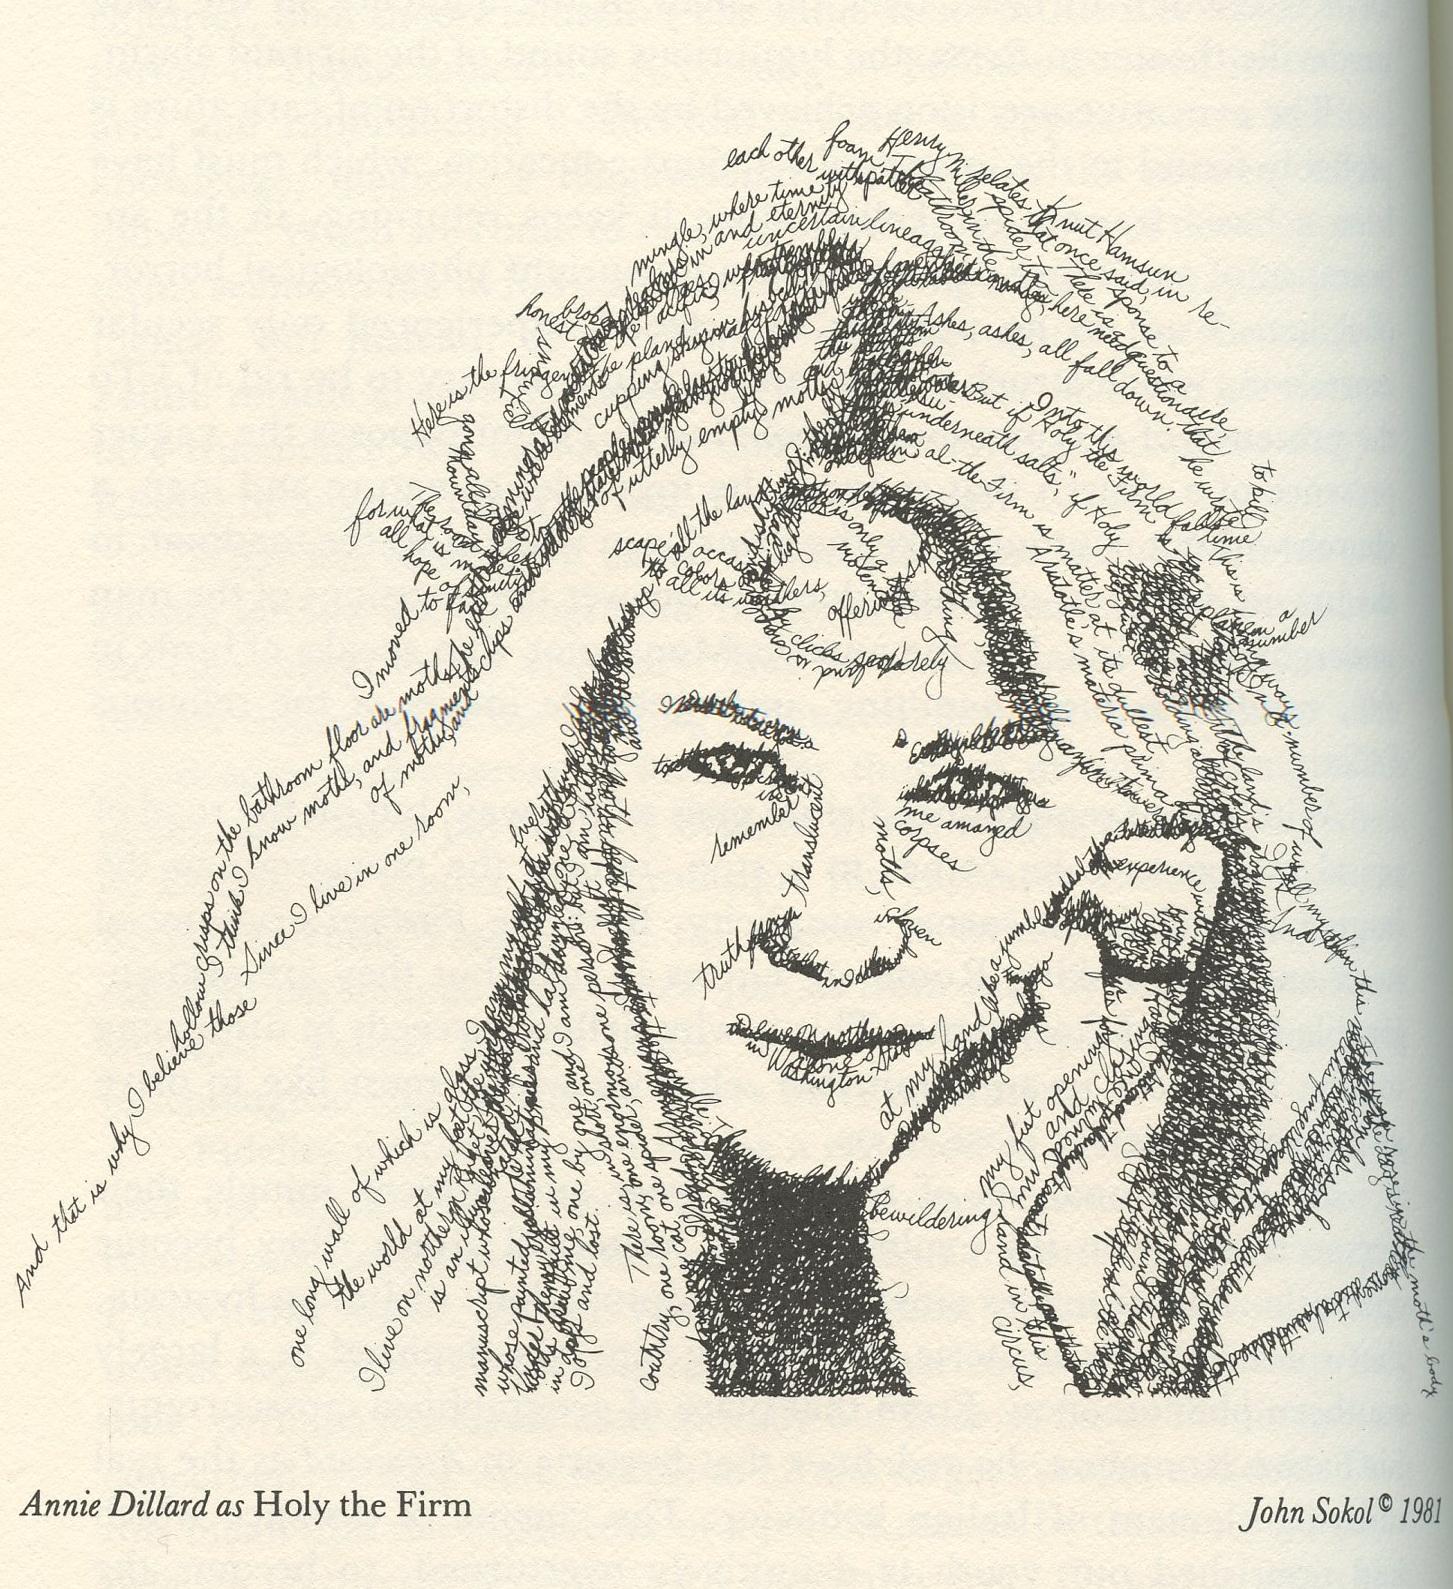 008 Essay Example Annie Dillard Essays Stirring Stunt Pilot Pdf An American Childhood Full